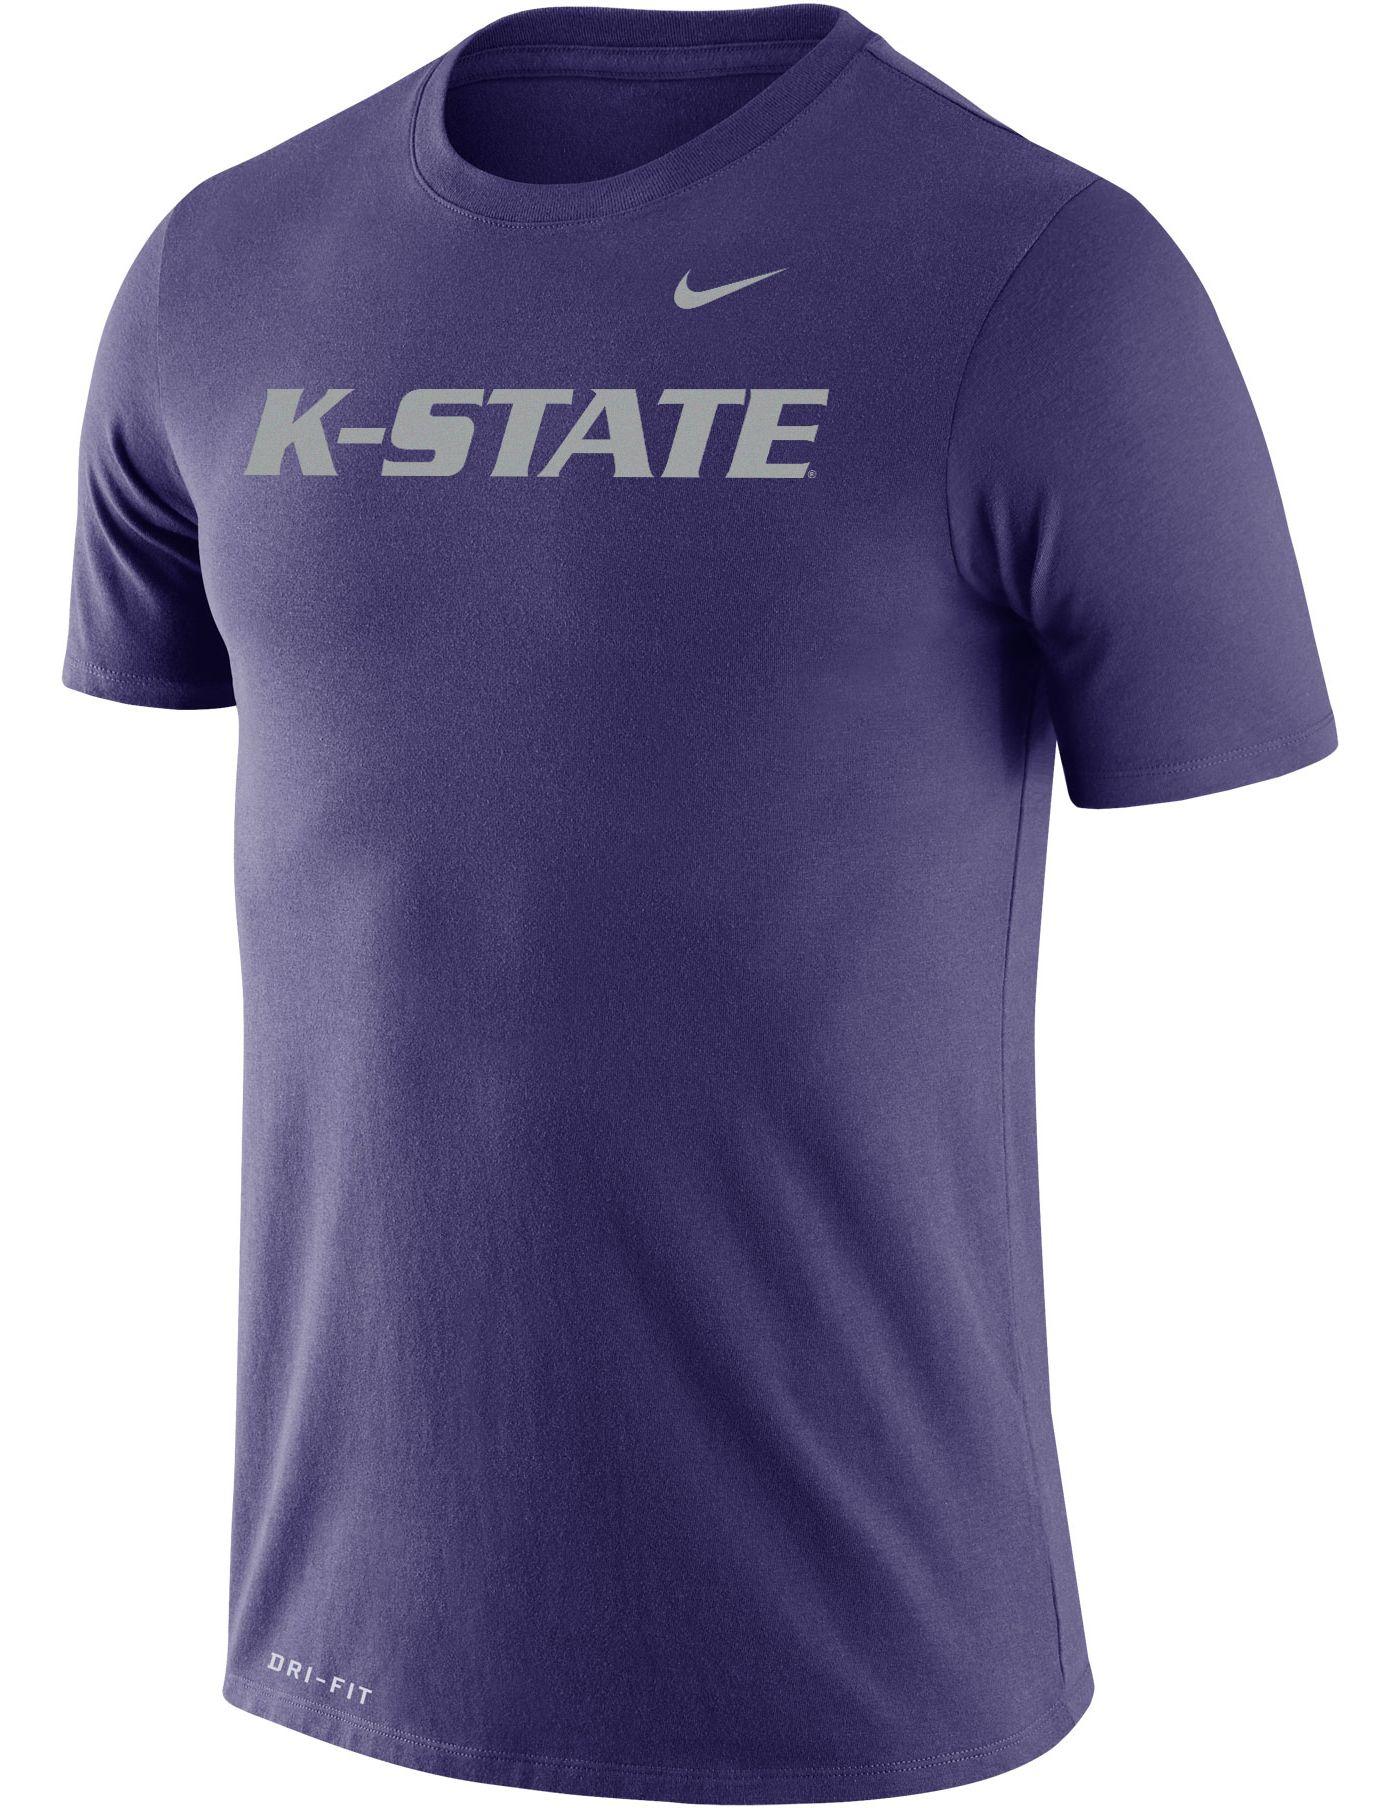 Nike Men's Kansas State Wildcats Purple Dri-FIT Cotton Word T-Shirt